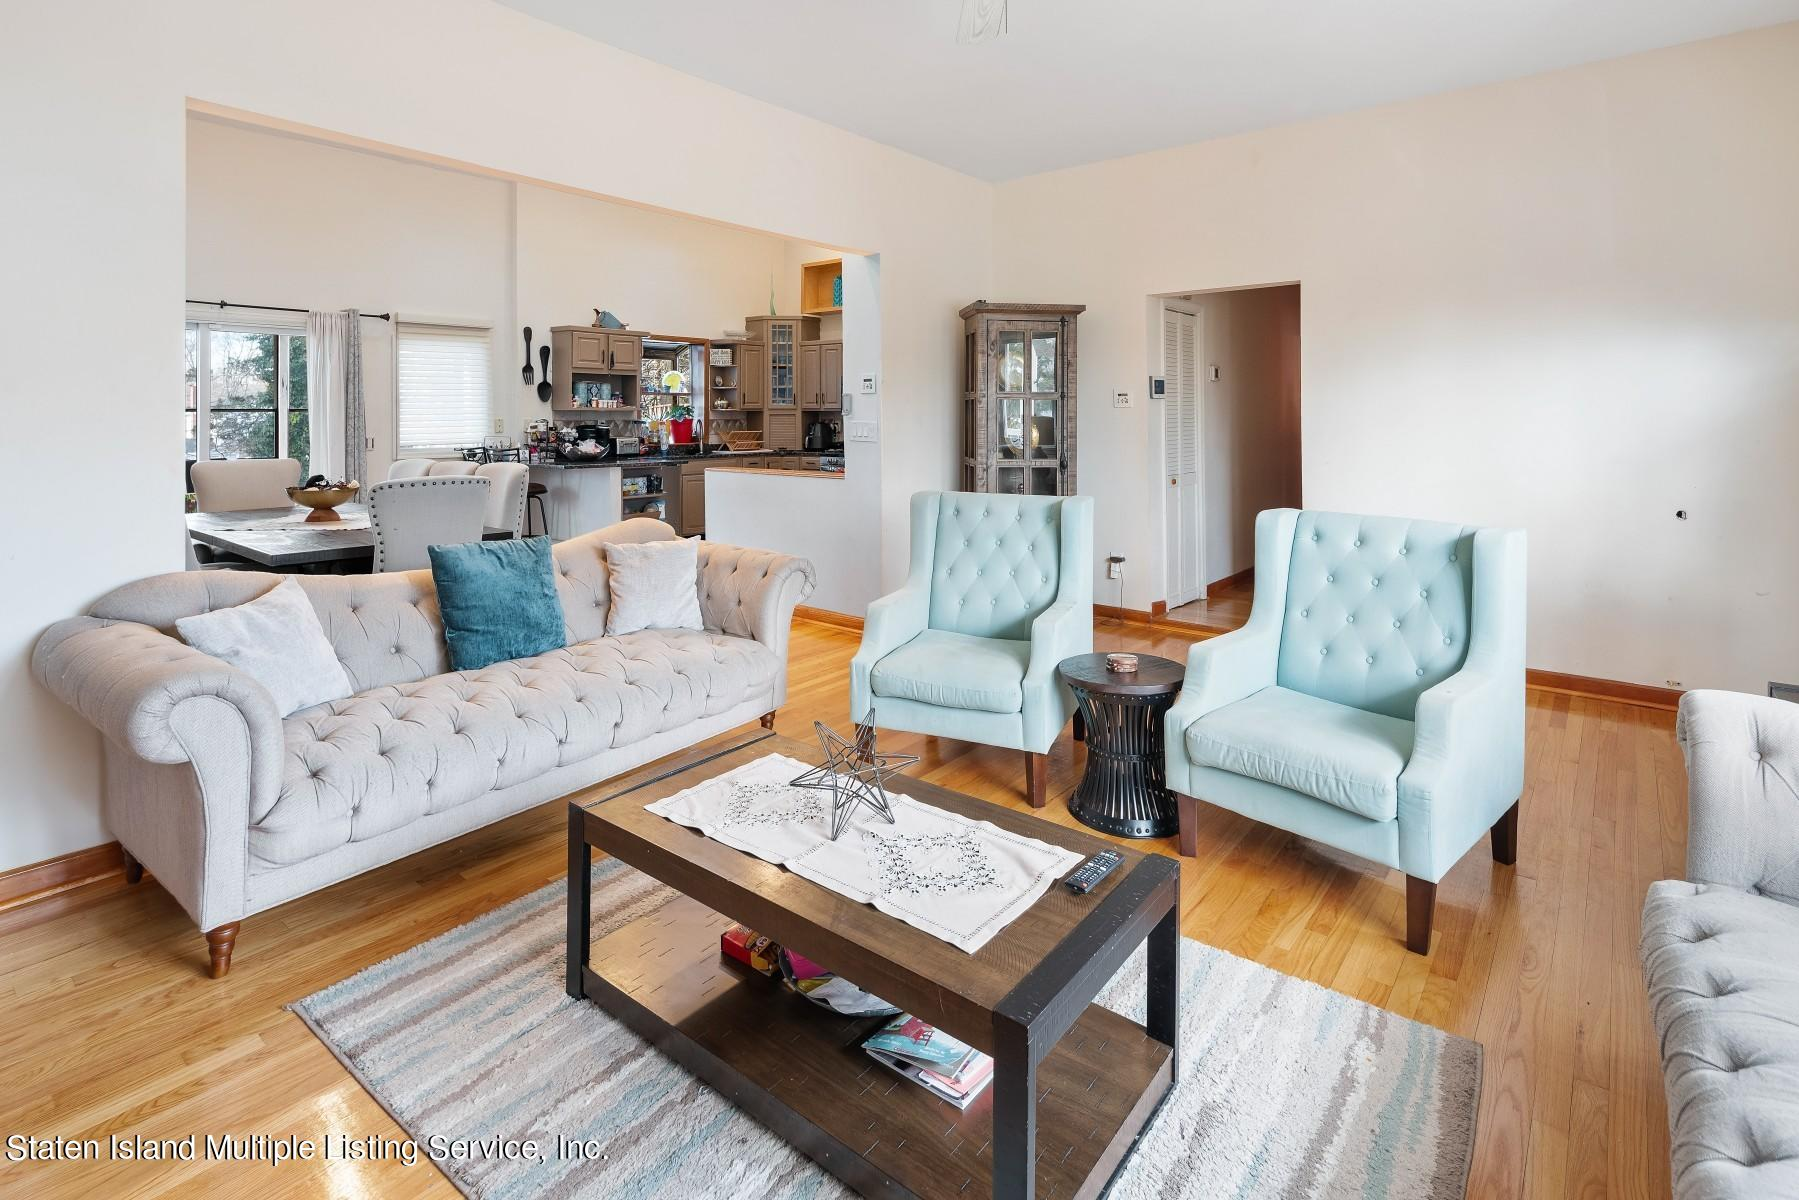 Single Family - Detached 8 Bionia Avenue  Staten Island, NY 10305, MLS-1142818-7